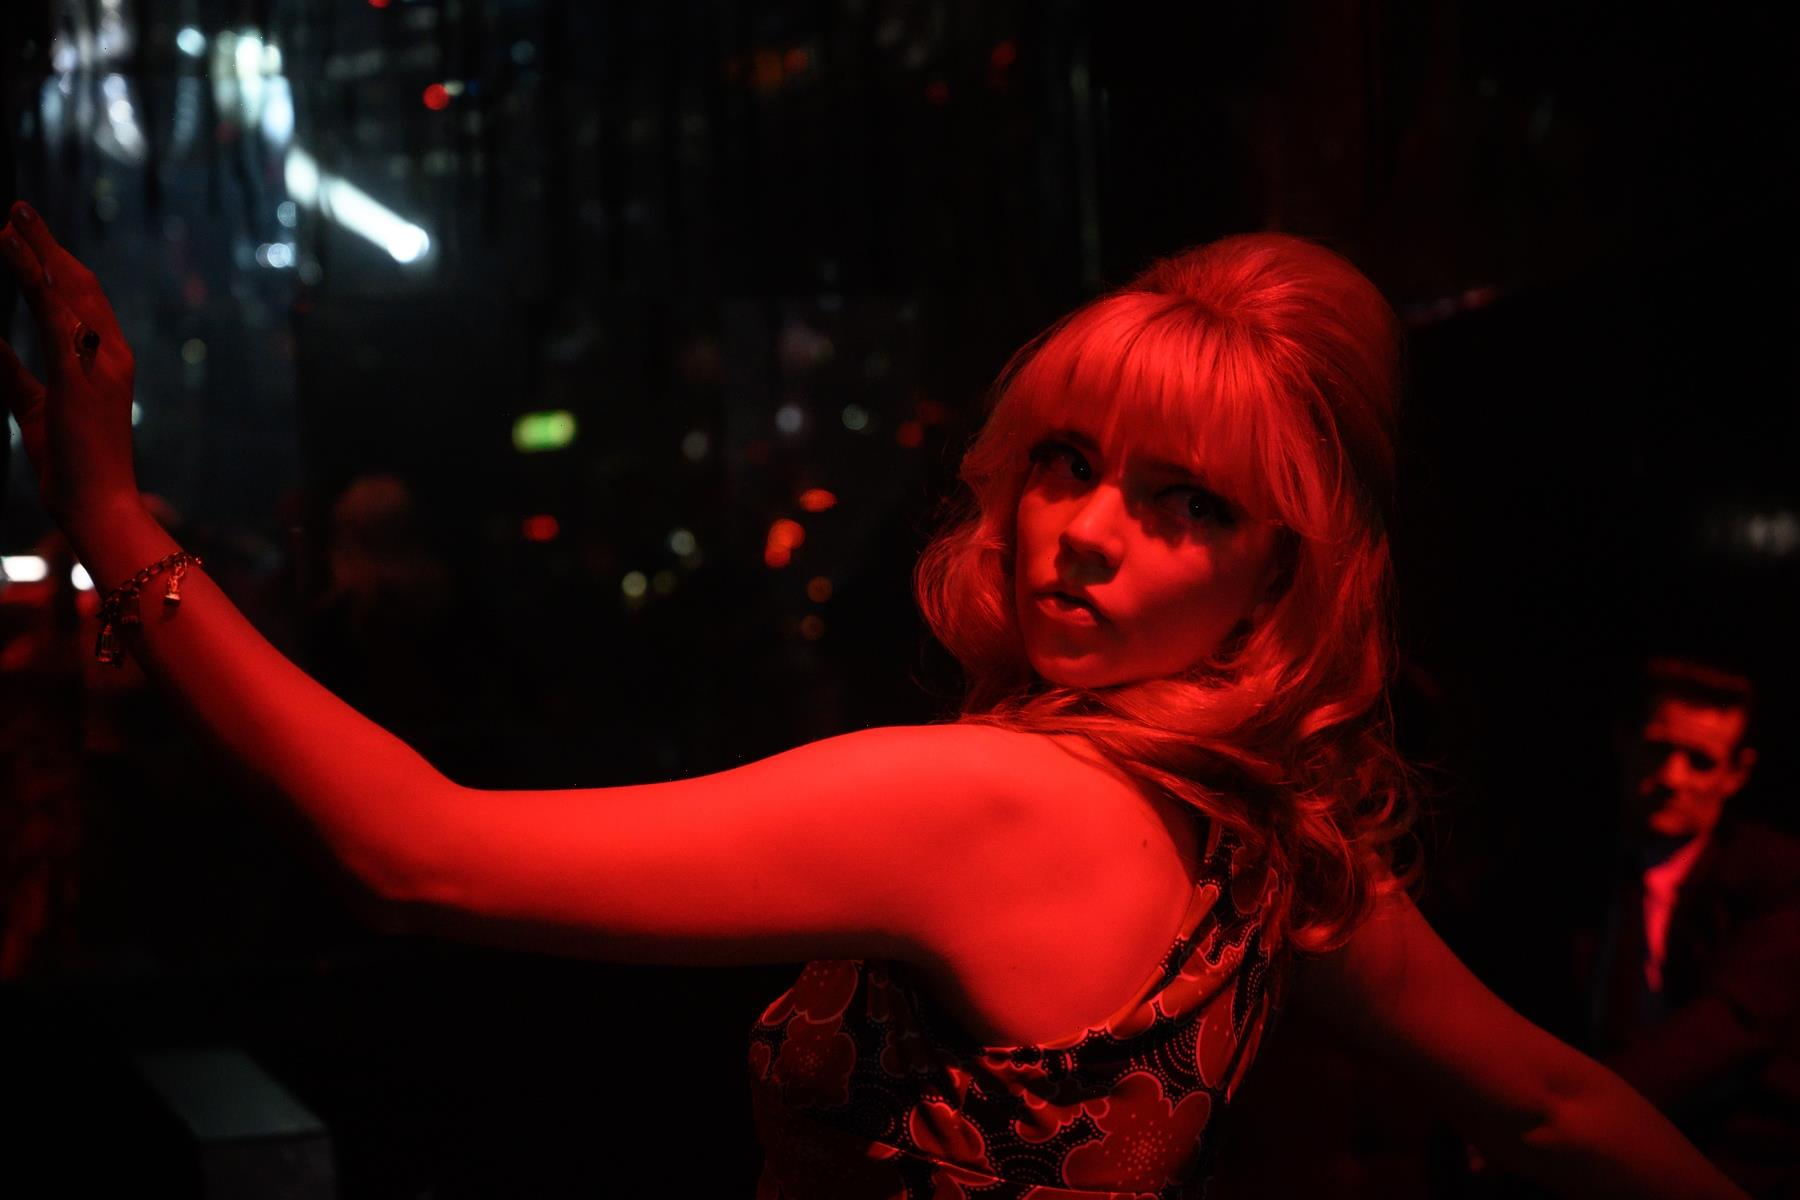 London's Swinging Sixties Turn Sinister in New 'Last Night in Soho' Trailer